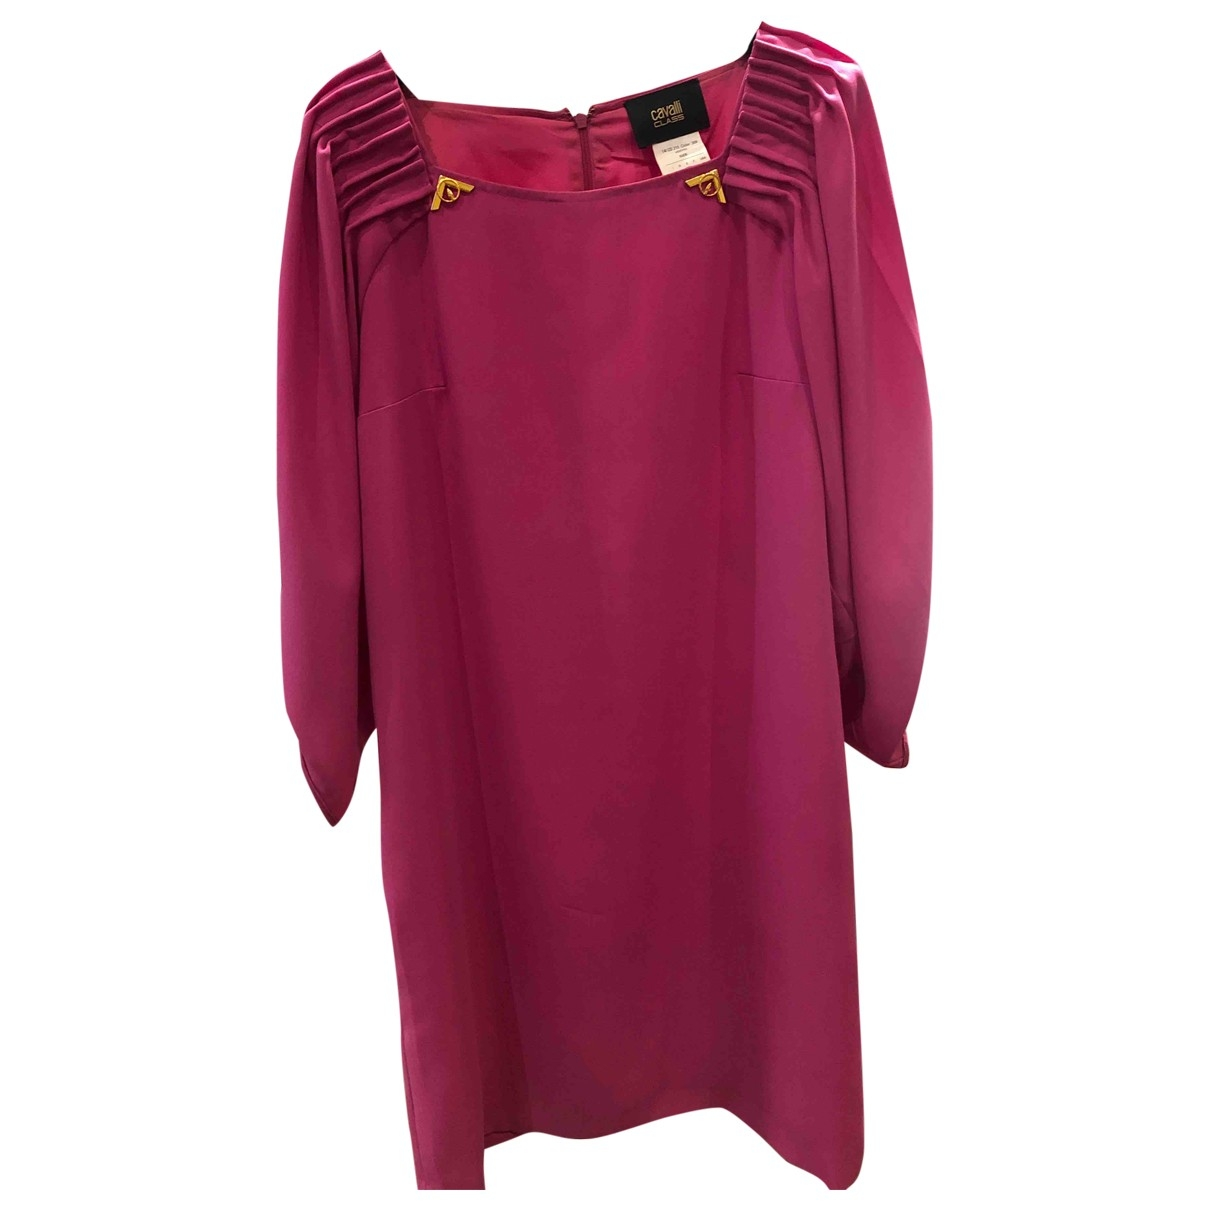 Class Cavalli \N Pink dress for Women 42 IT